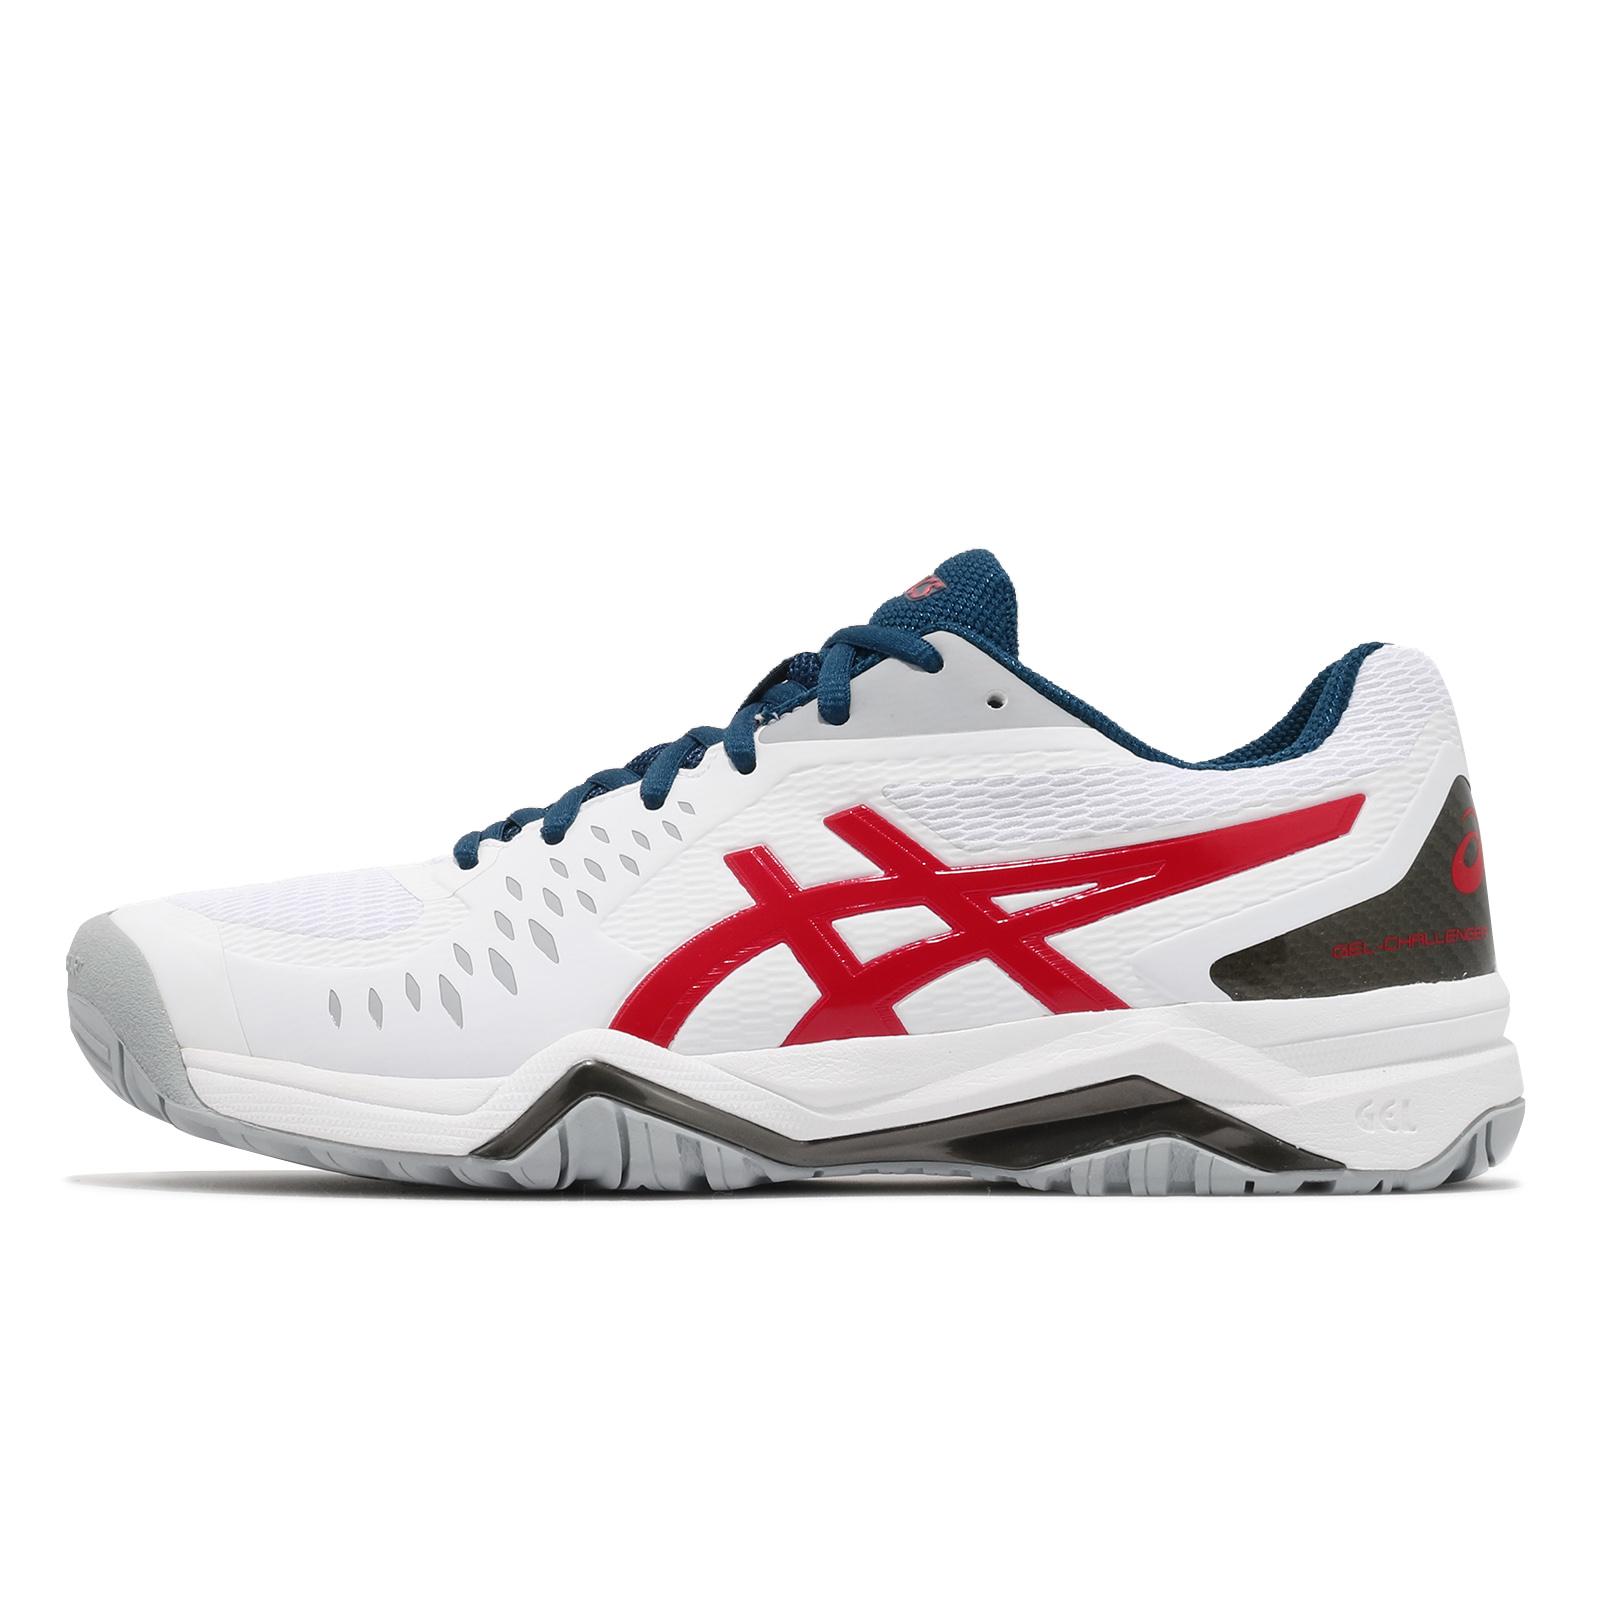 Asics 網球鞋 Gel-Challenger 12 男鞋 紅 白 藍 亞瑟士 【ACS】 1041A045-117